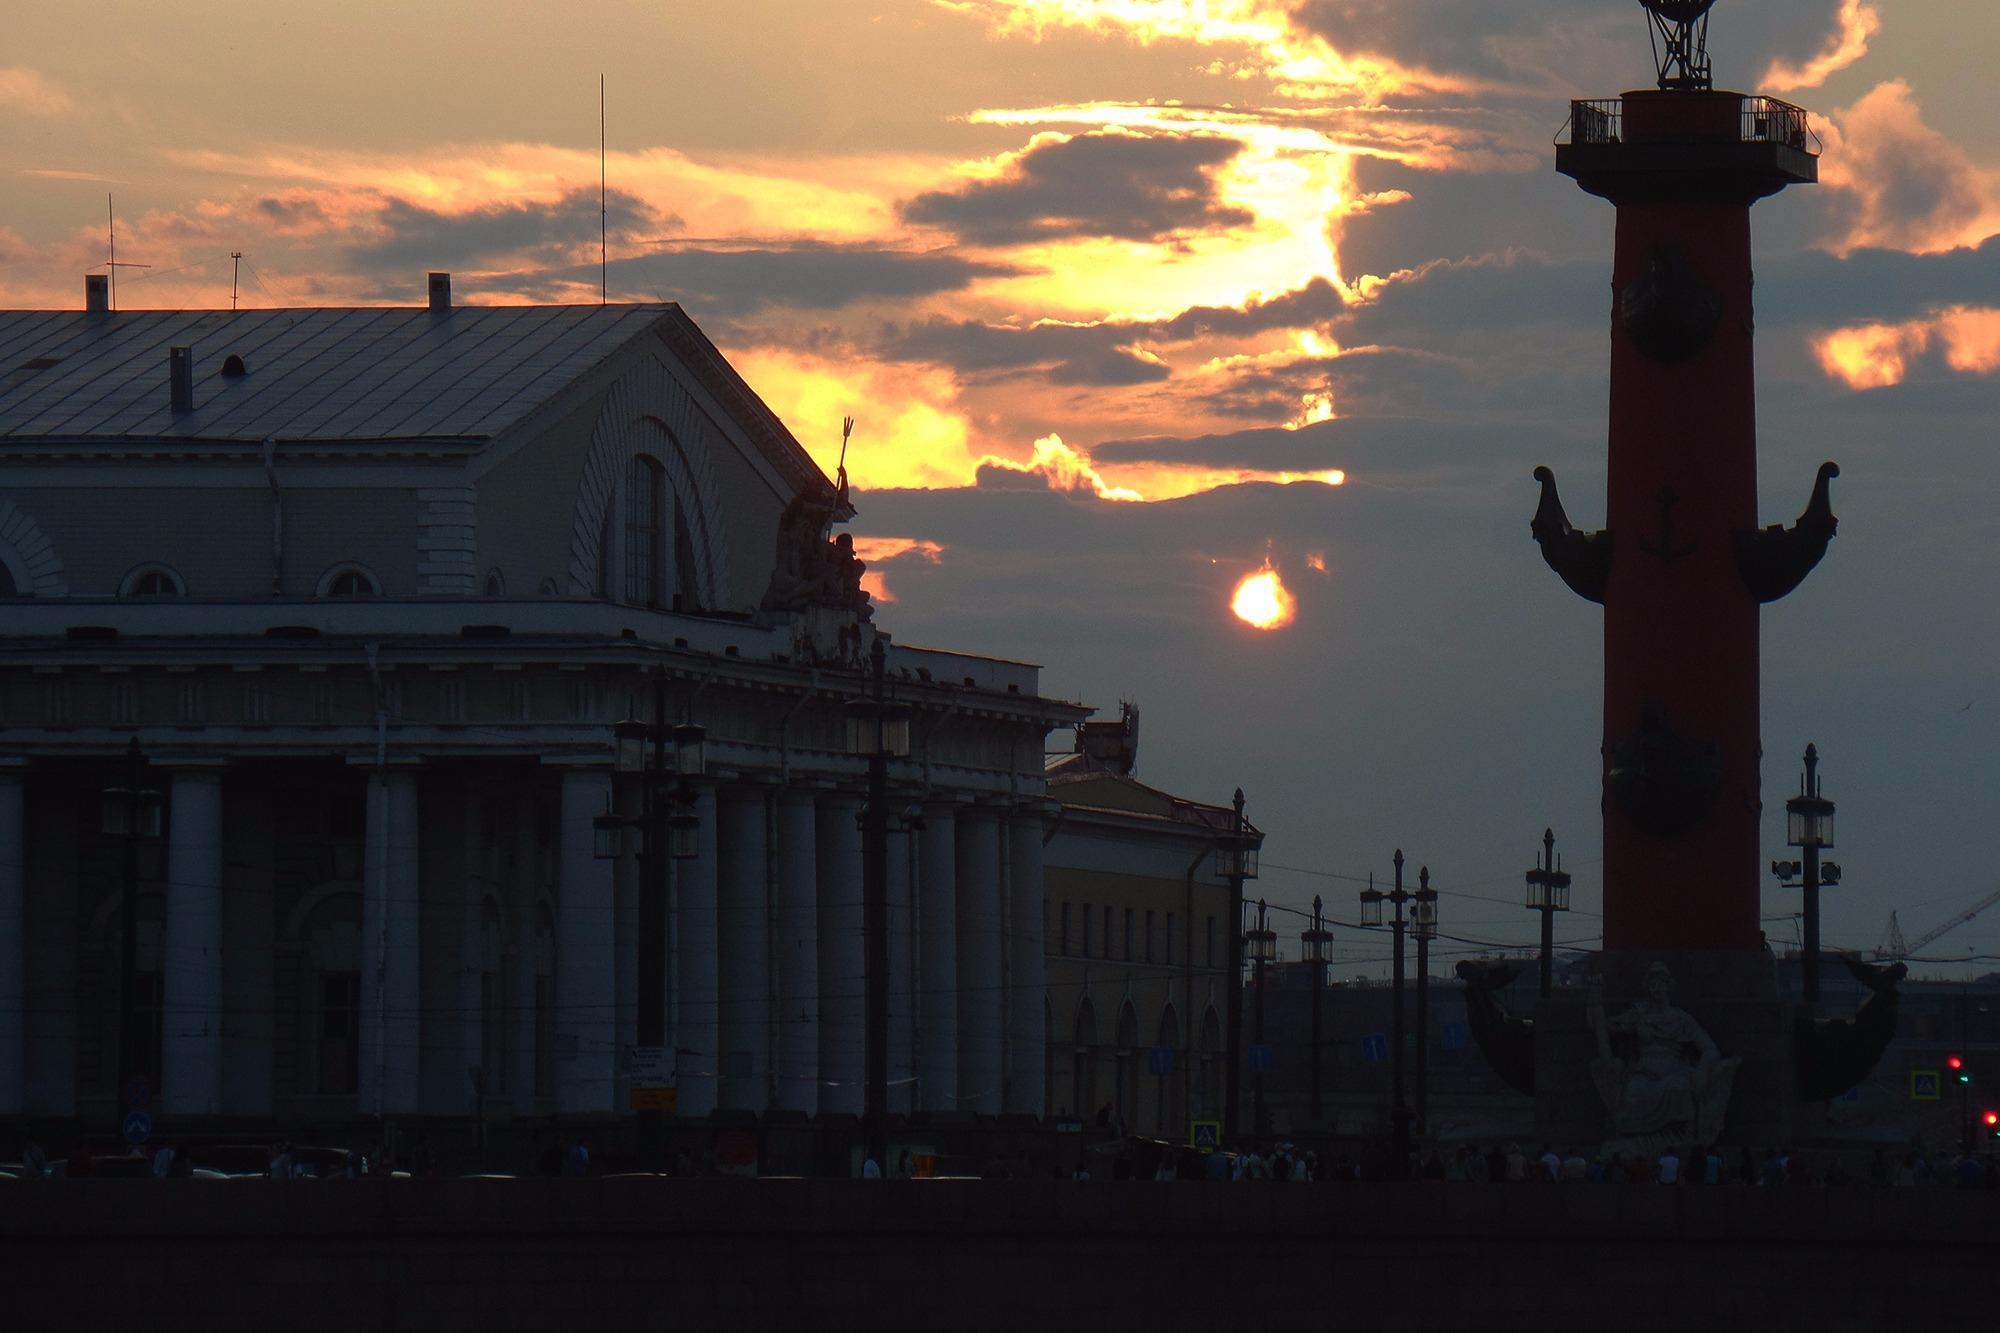 Здание Биржи в Санкт-Петербурге, Санкт-Петербург, Россия